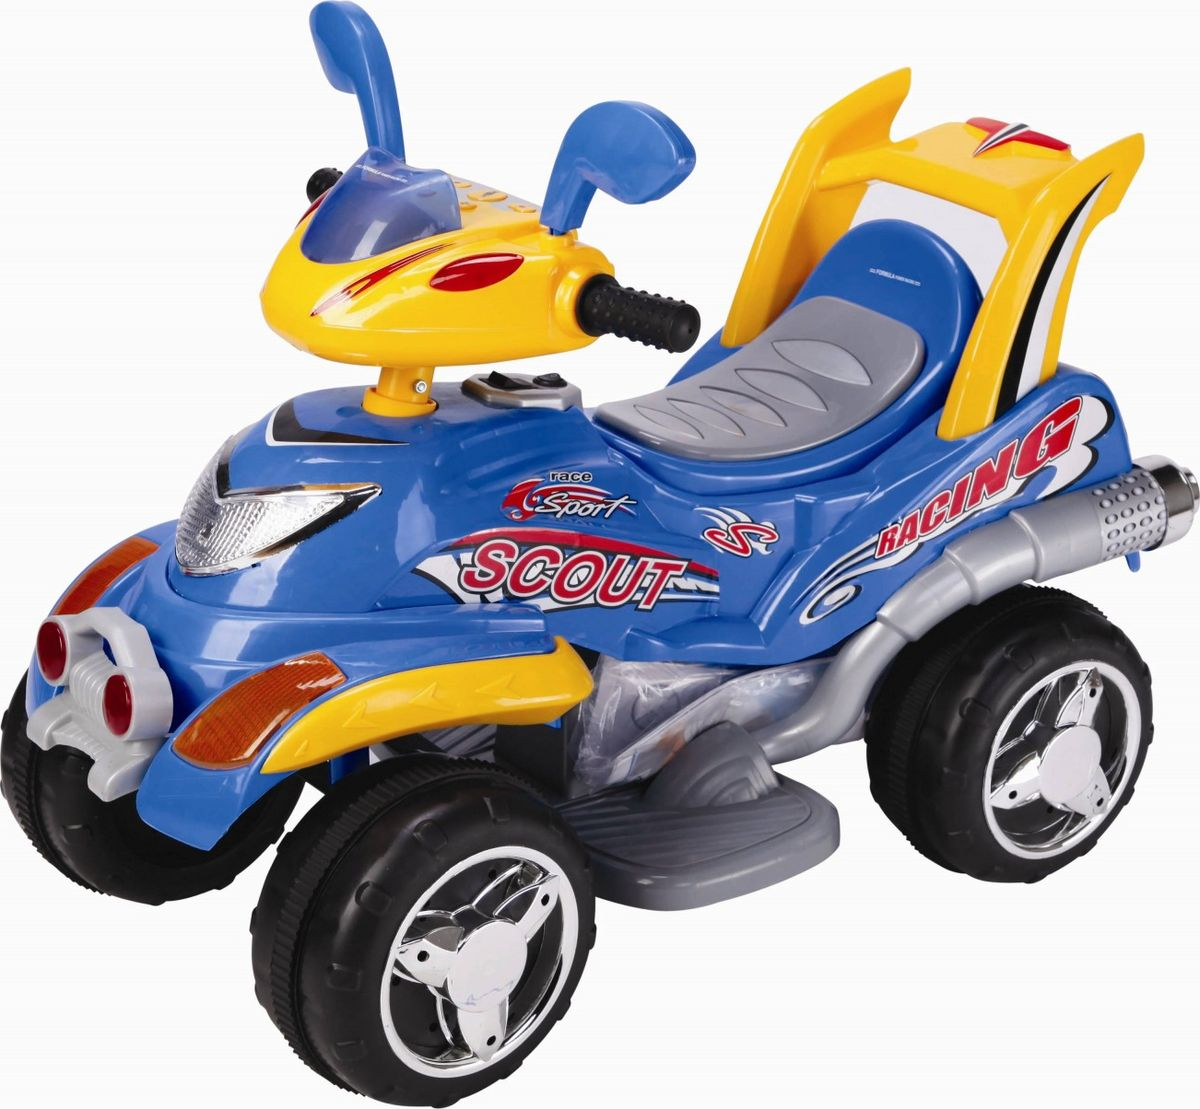 Квадроцикл на аккумуляторе цвет синий CH9912 -  Электромобили